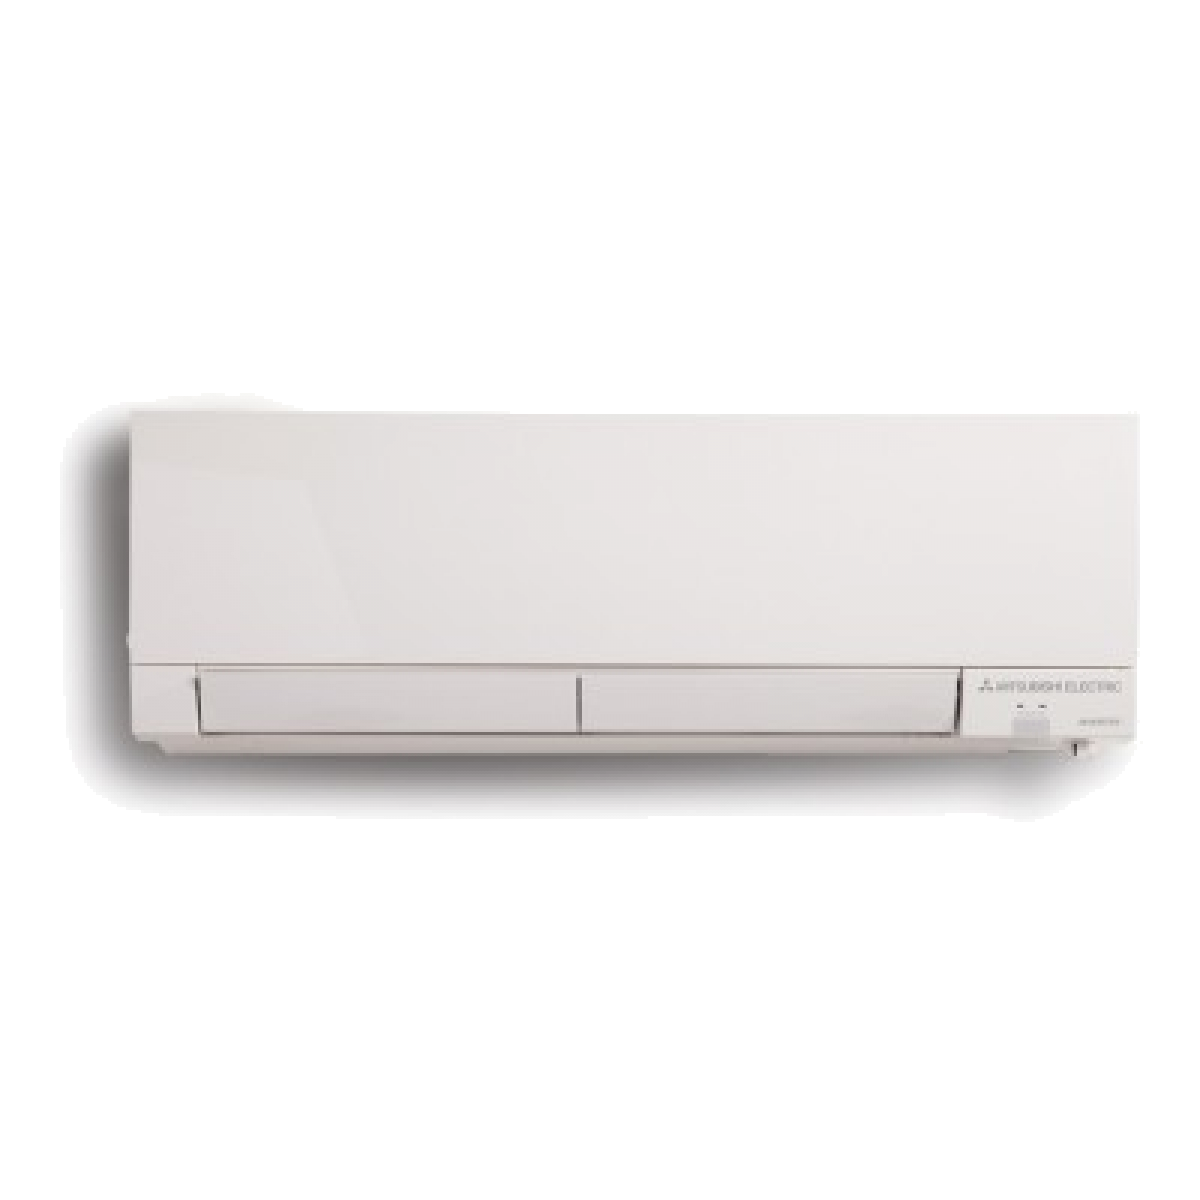 Mitsubishi Room Air Conditioner Reviews: Mitsubishi 2 Zone 20K BTU Heat Pump Hyper Heat With Two